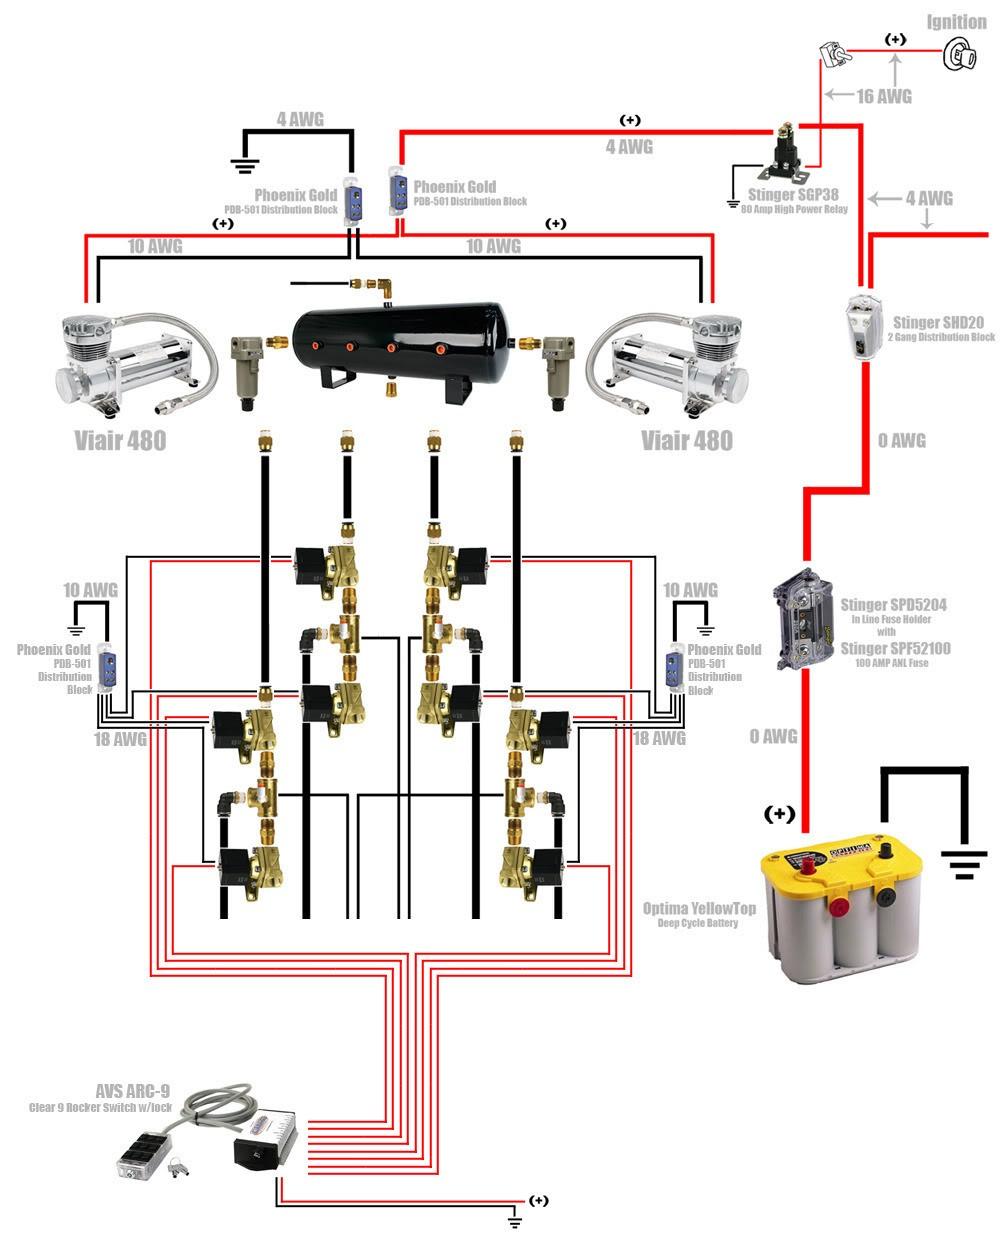 airbag suspension valve wiring diagram air ride solenoid with rh releaseganji net Preassure Switch Air Ride